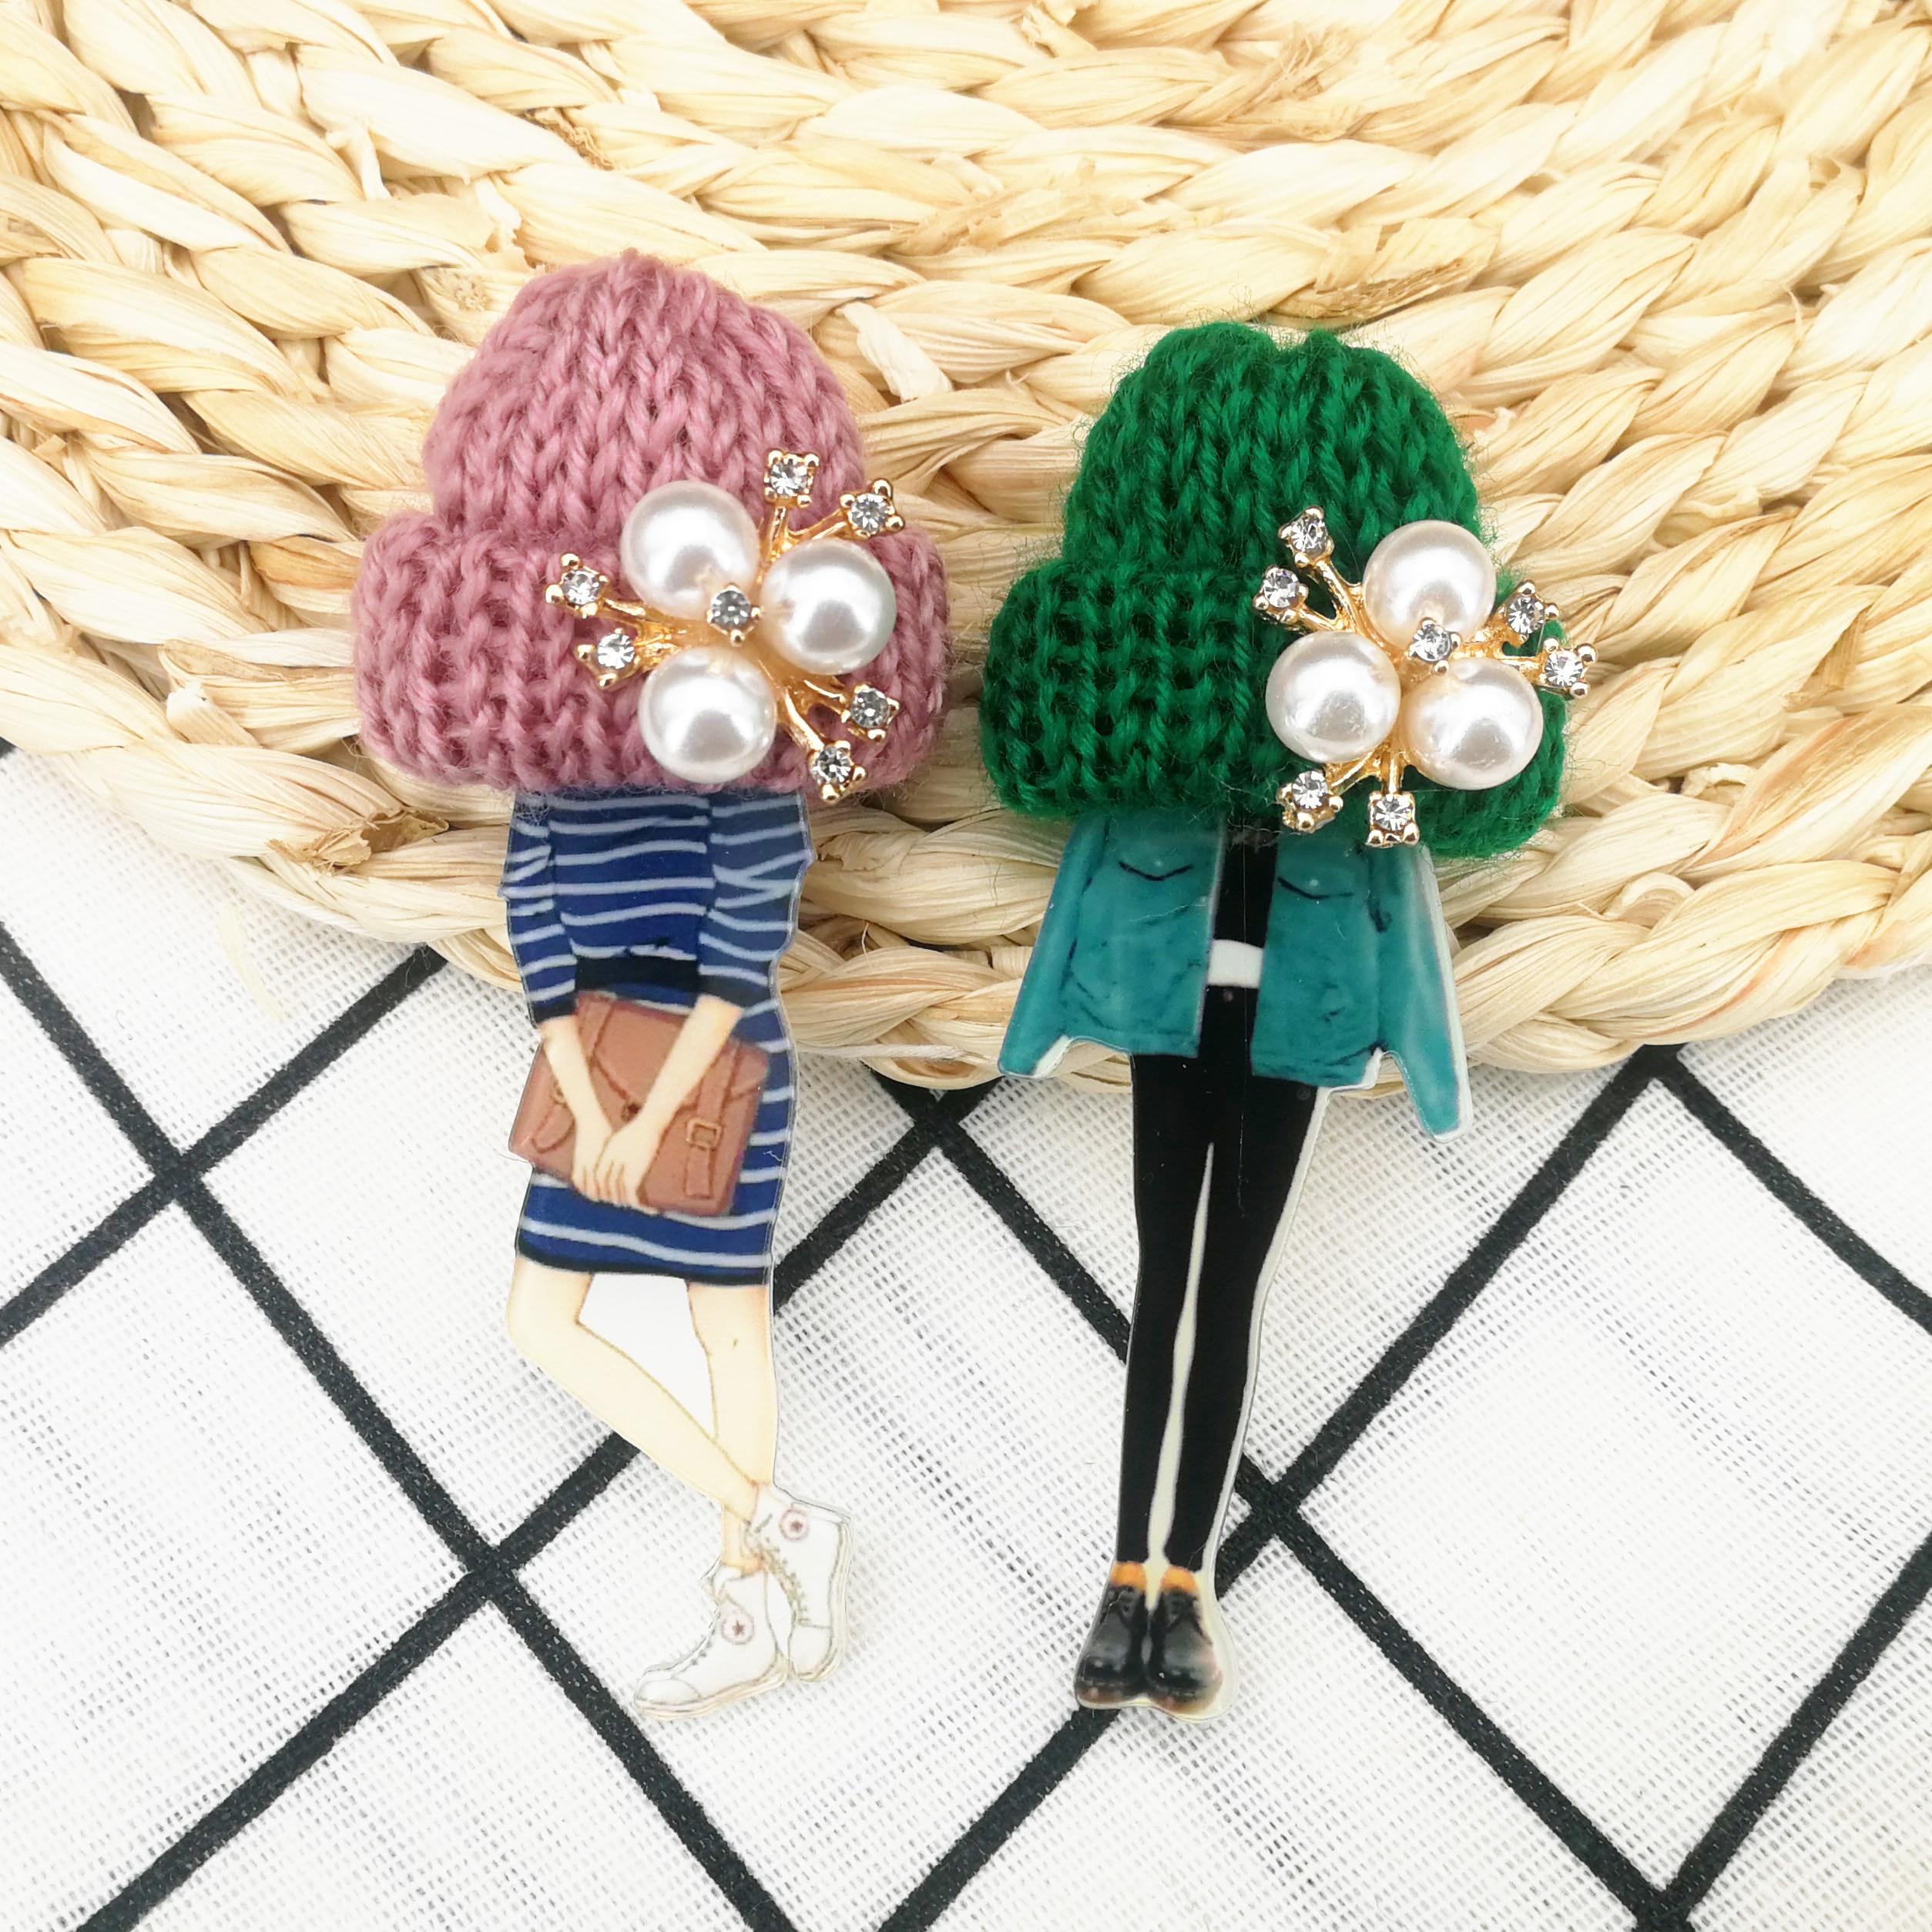 Girls Cute Lovely Brooches For Woman Wool Hat Crystal Cartoon Badges Brooch Pins Fashion Harajuku Pins Icons Gifts Drop-Shipping